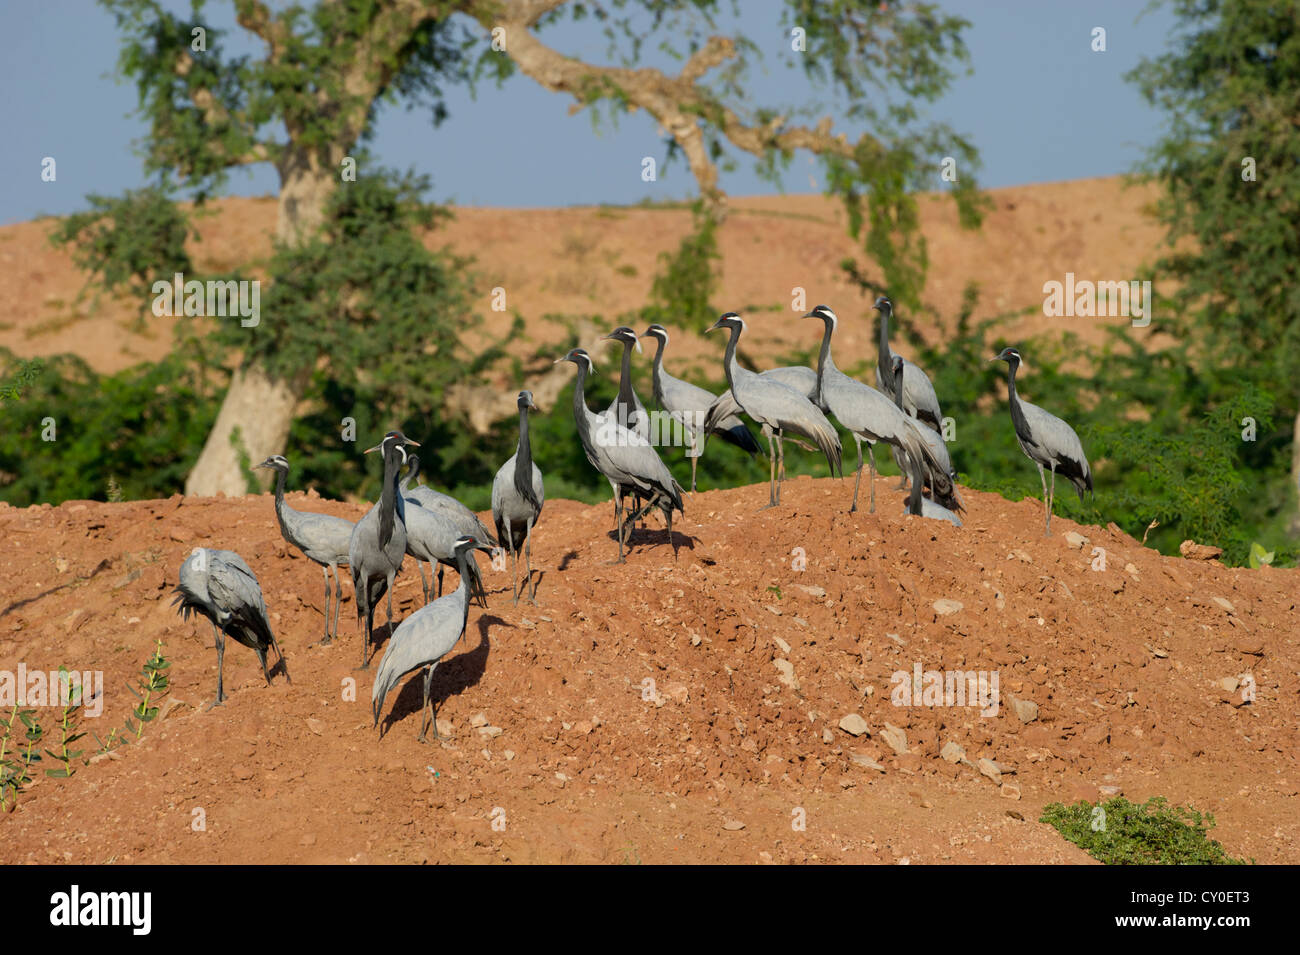 Demoiselle cranes anthropoides virgo at kichan in thar desert stock photo royalty free image for Kichan photo